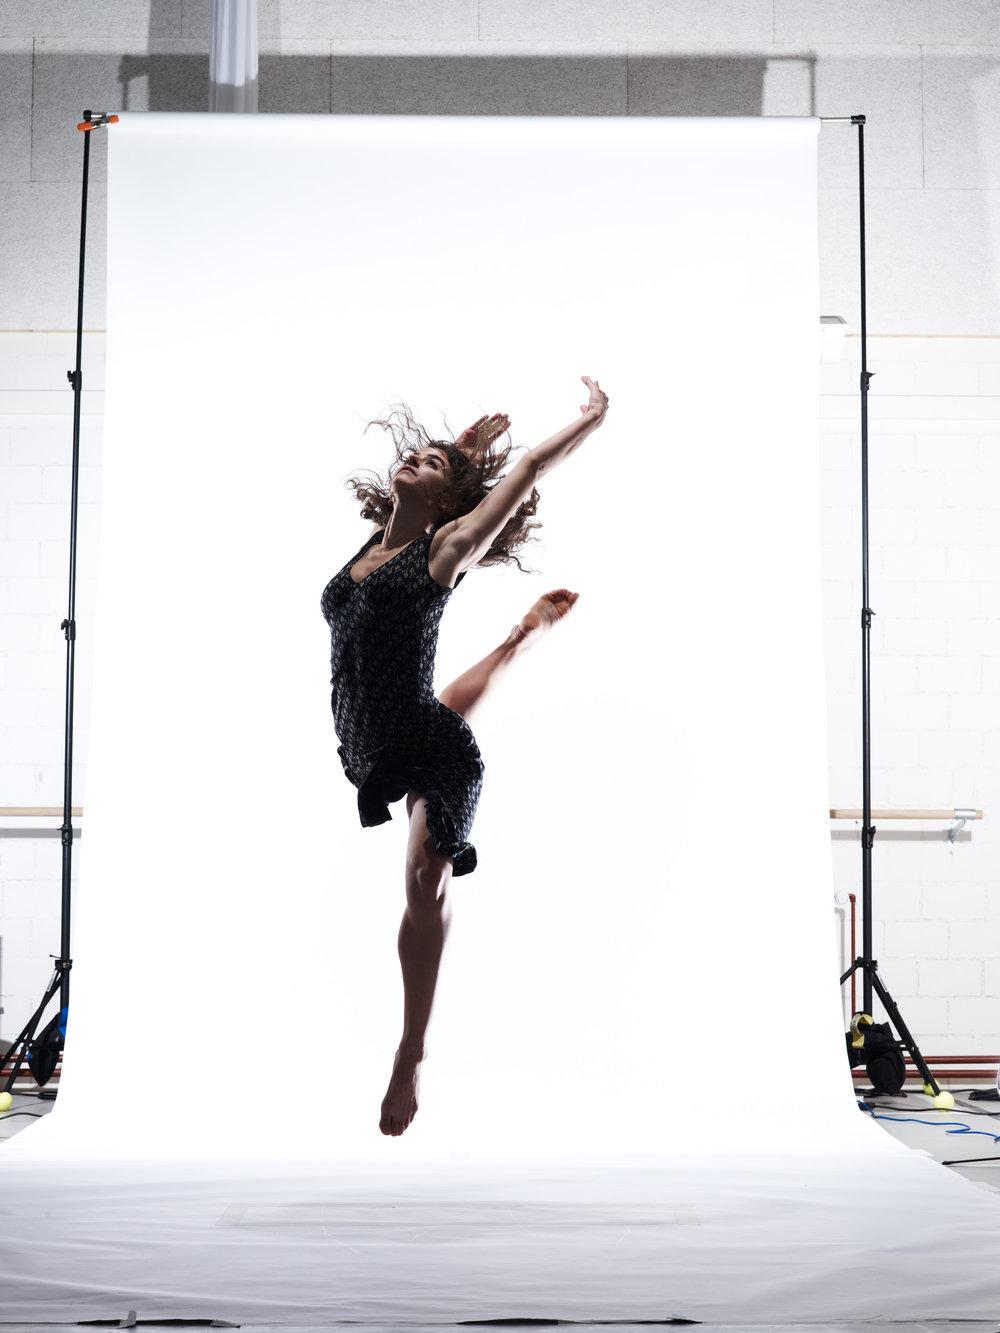 Bern_Ballet08_2-006003.jpg